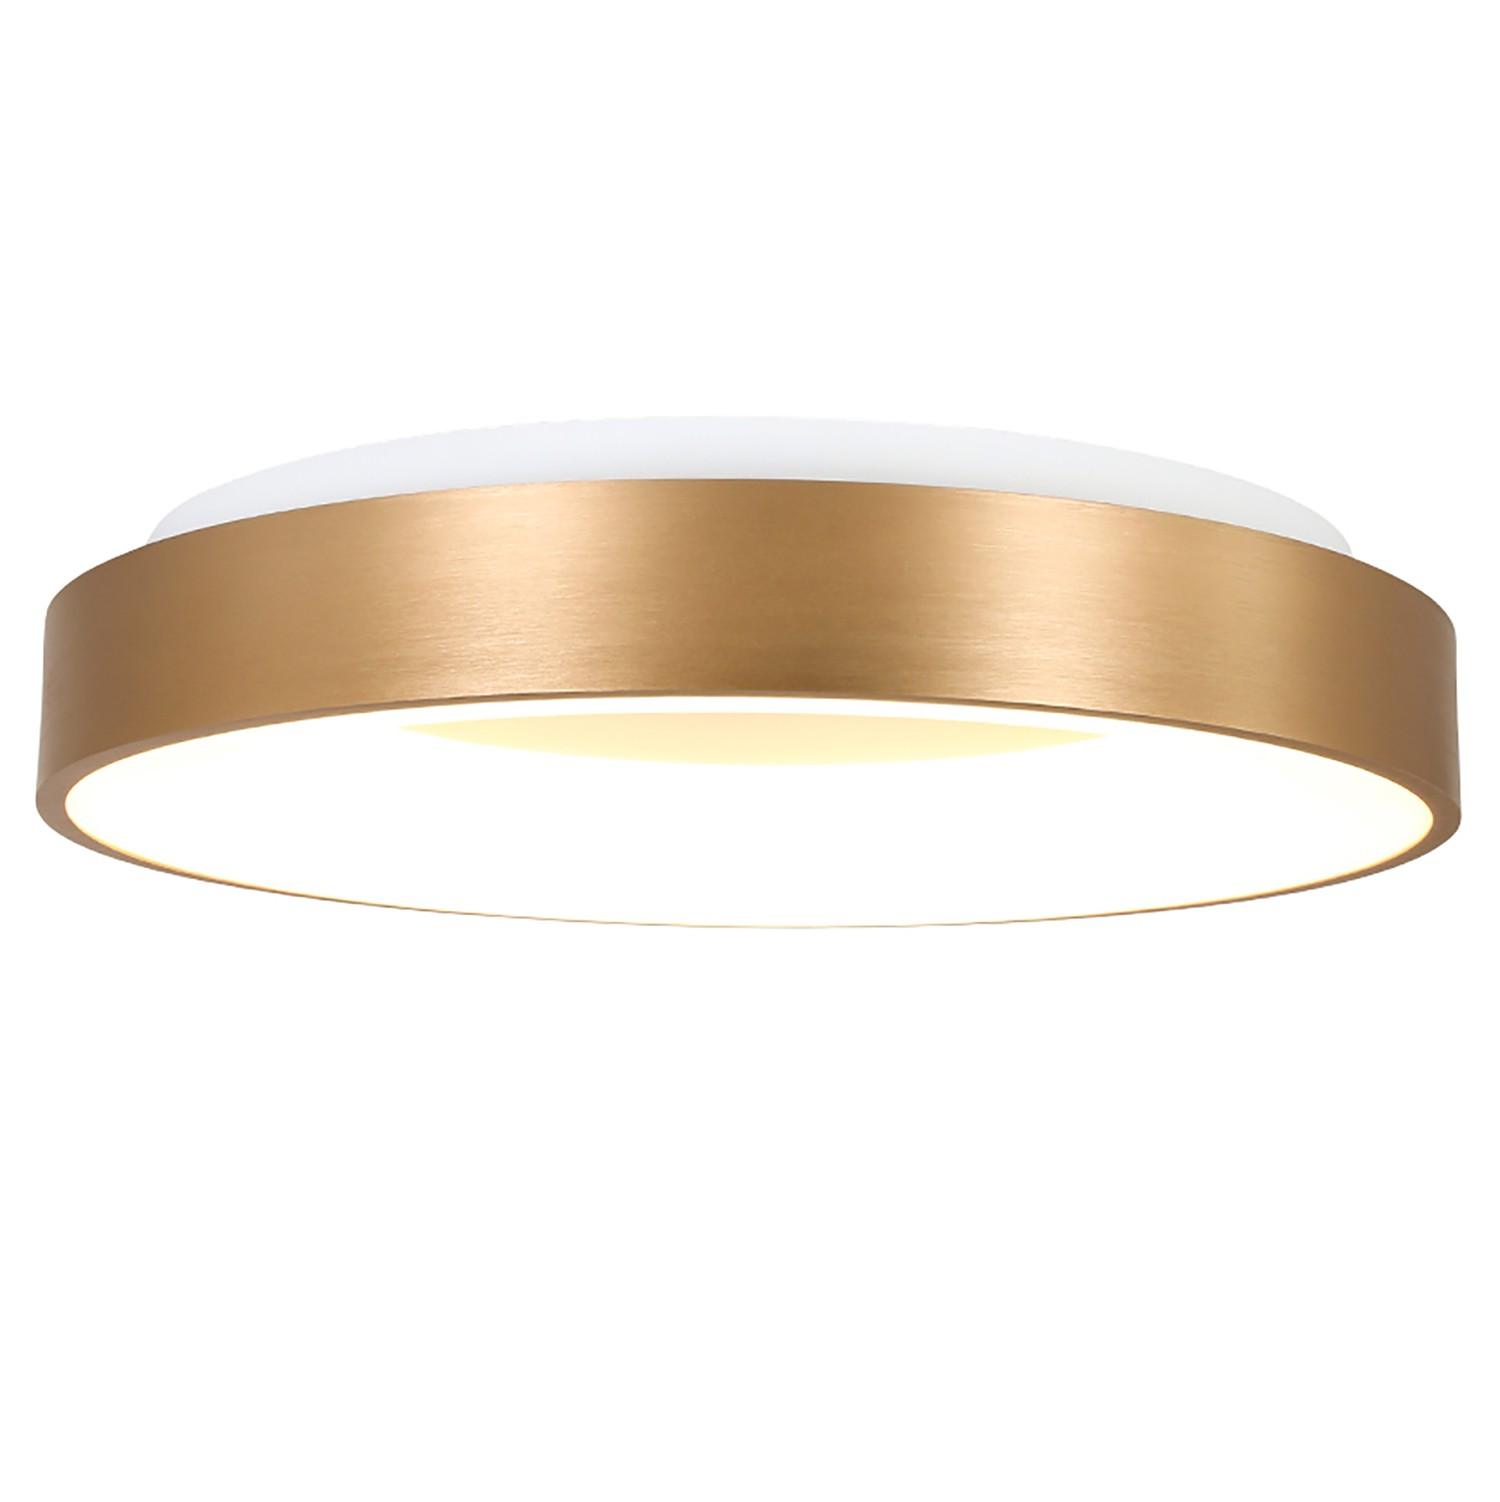 home24 LED-Deckenleuchte Ringlede